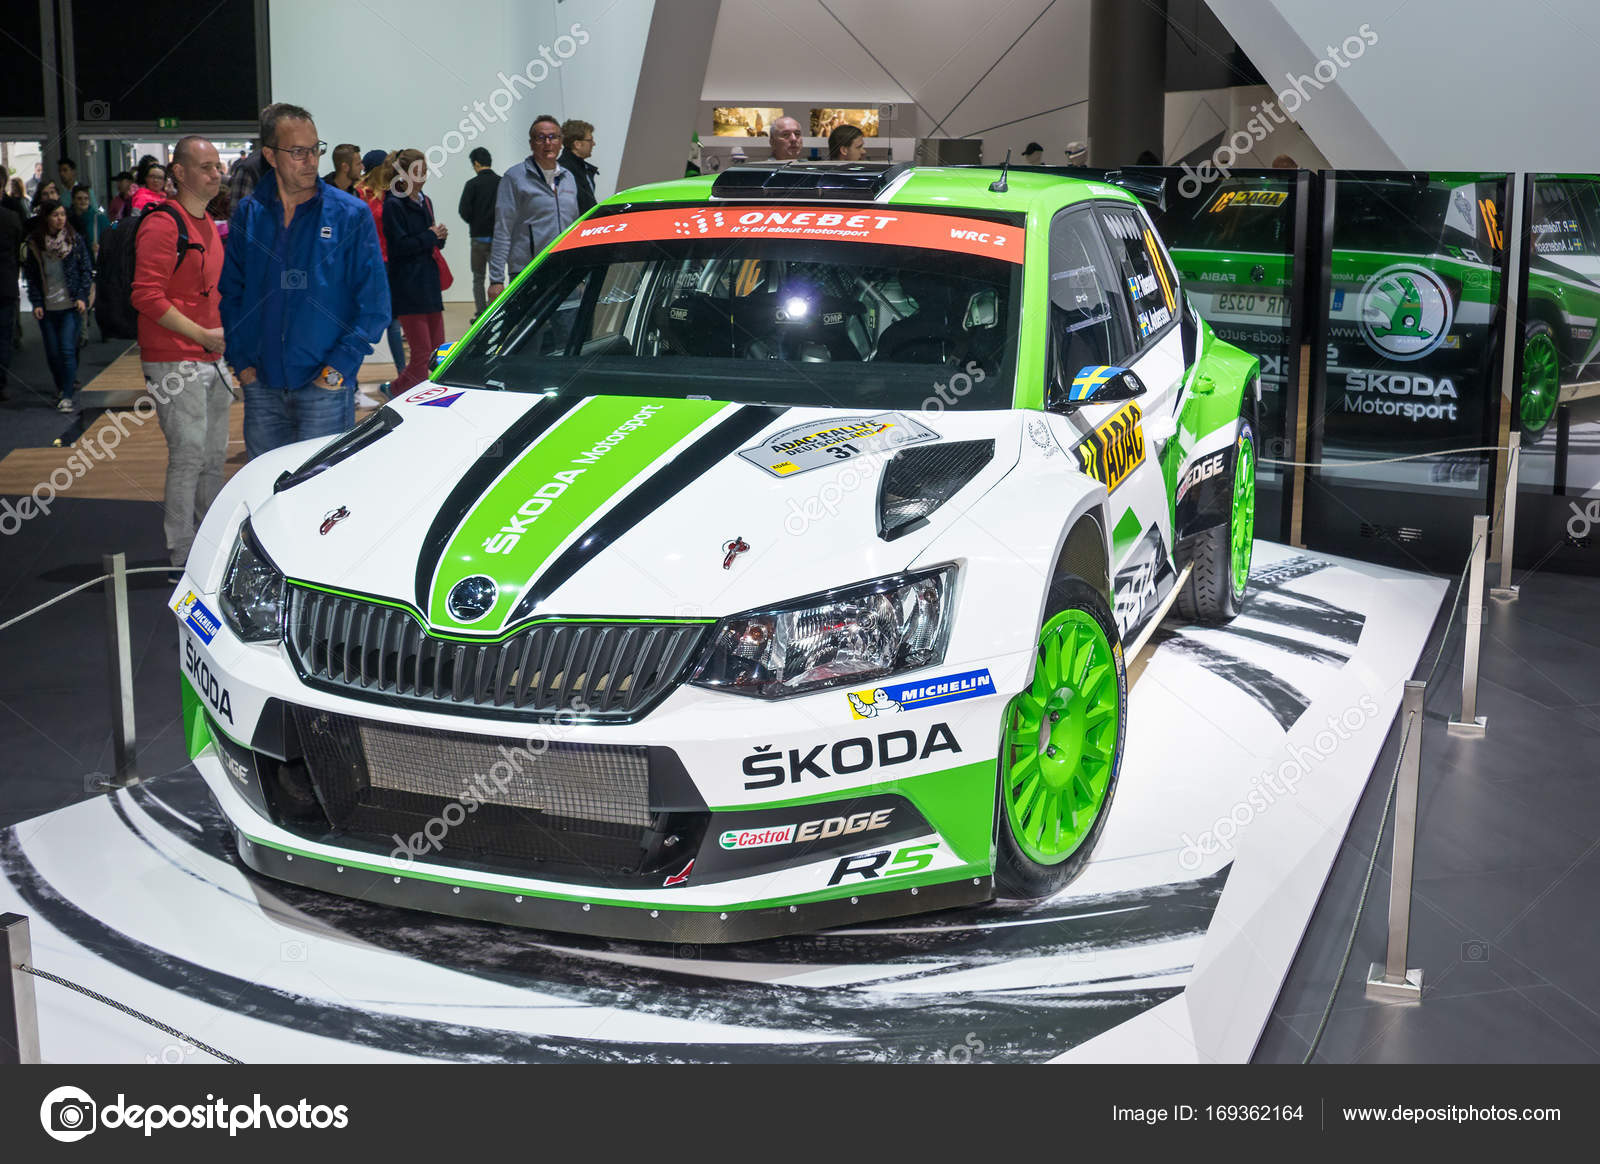 Pictures Skoda R5 Skoda Fabia R5 Rally Car Stock Editorial Photo C Eans 169362164